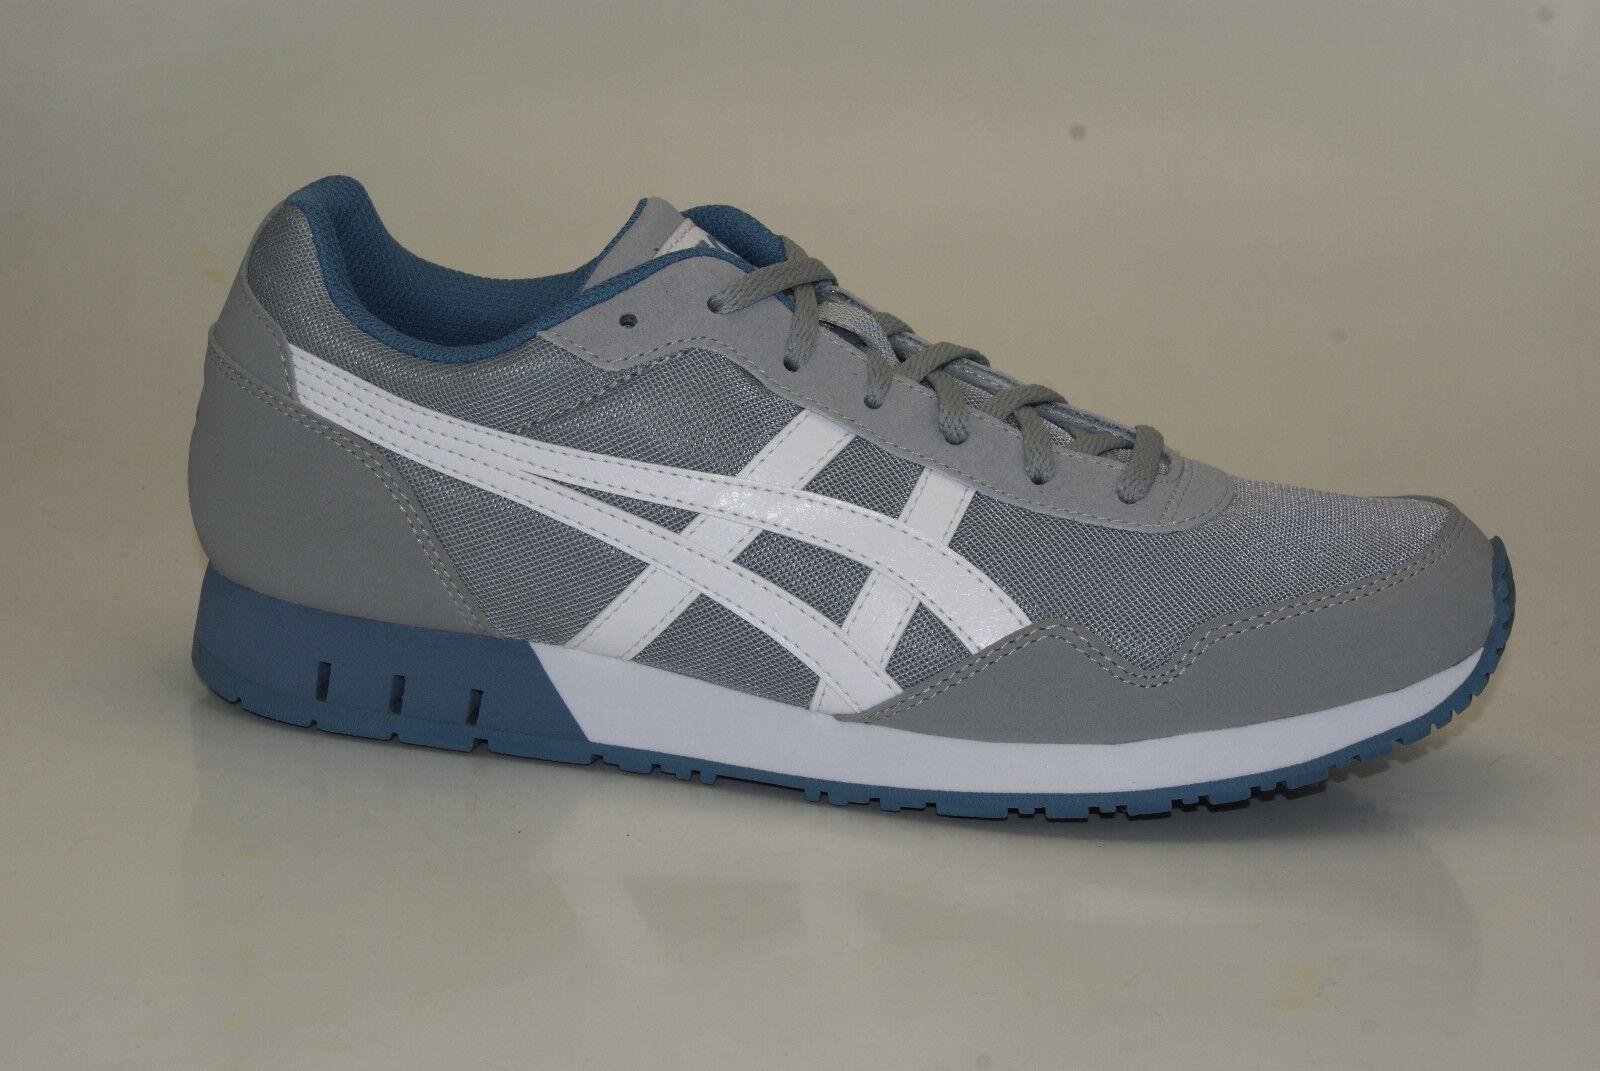 Asics Curreo Zapatillas de Deporte Gimanasia Zapatos Cordones Hombre Hn537-9601